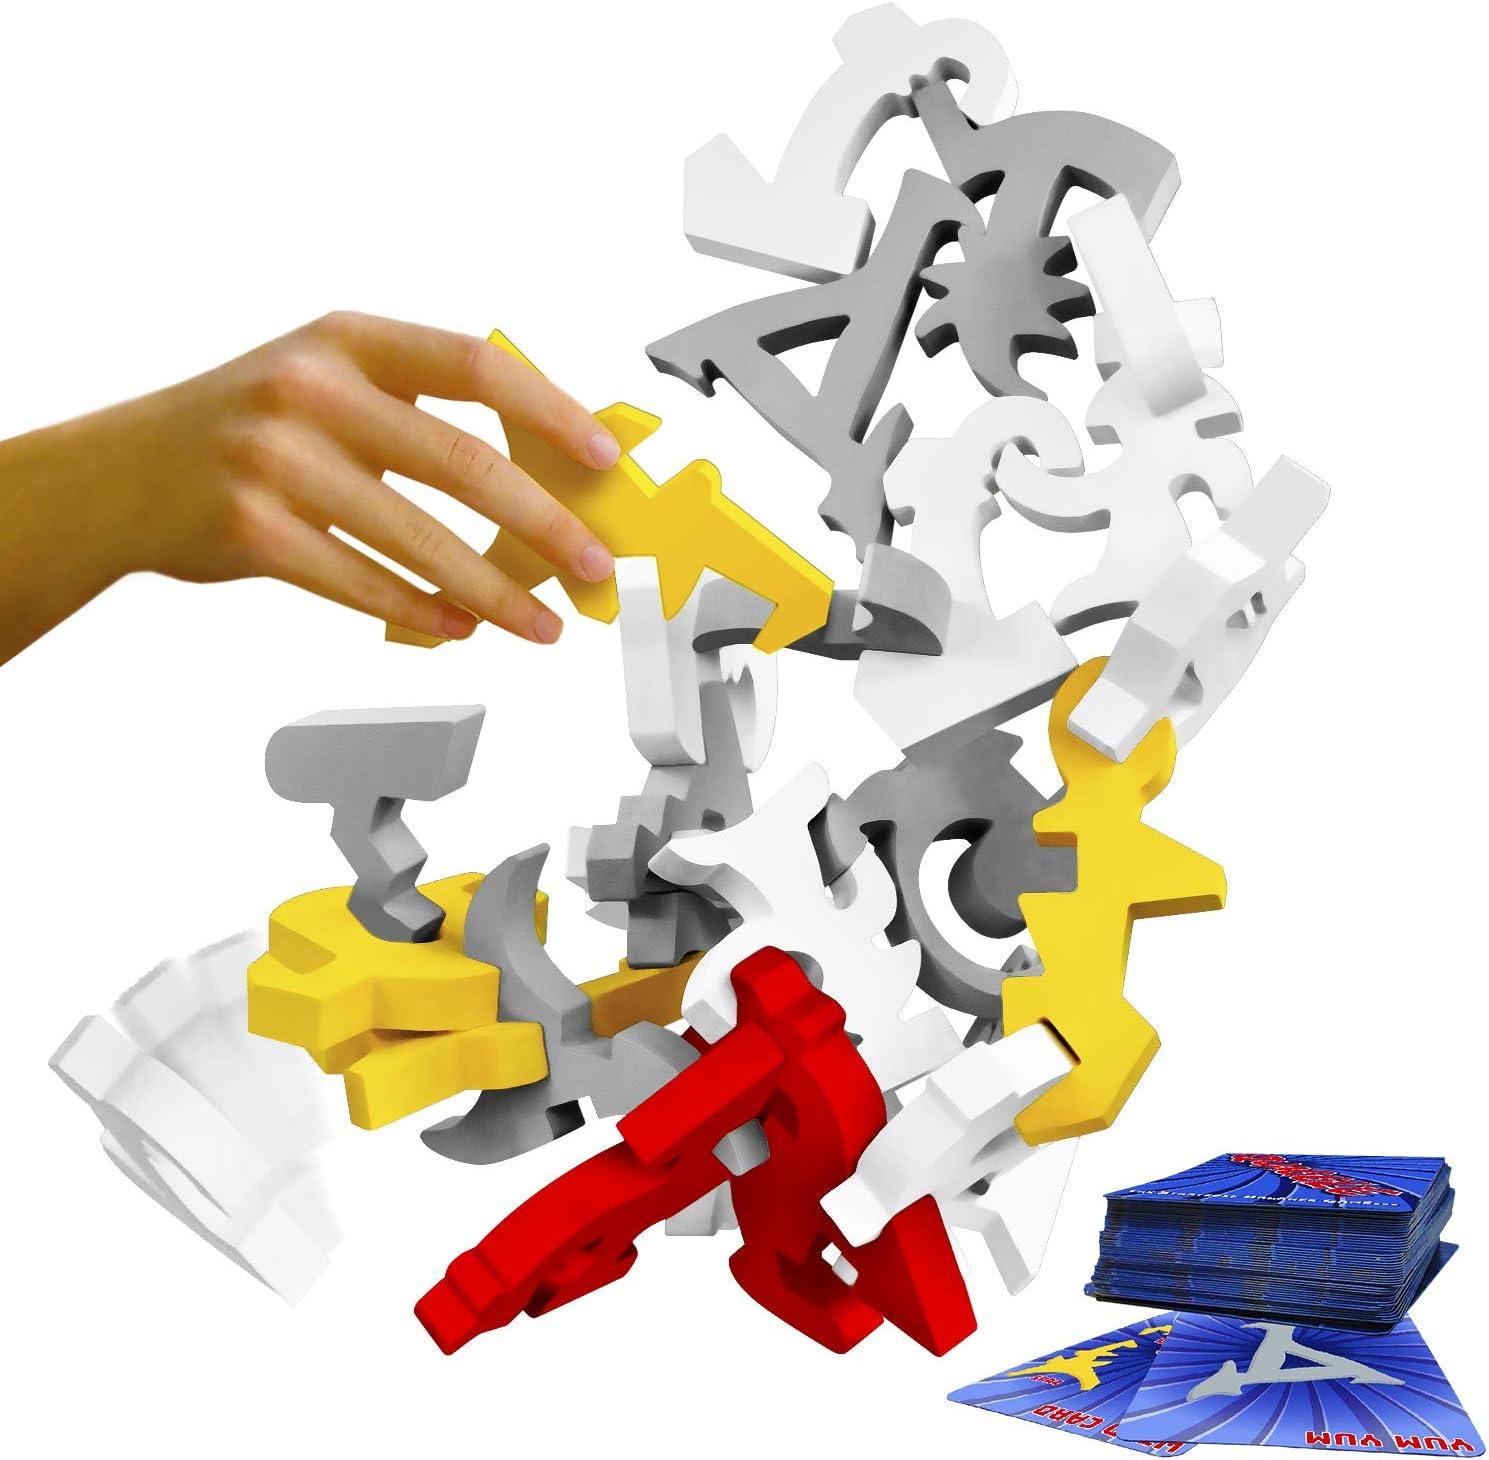 Quaggle Stacking Balance Game - Wood Blocks Ga Attention brand List price Premium Suspend